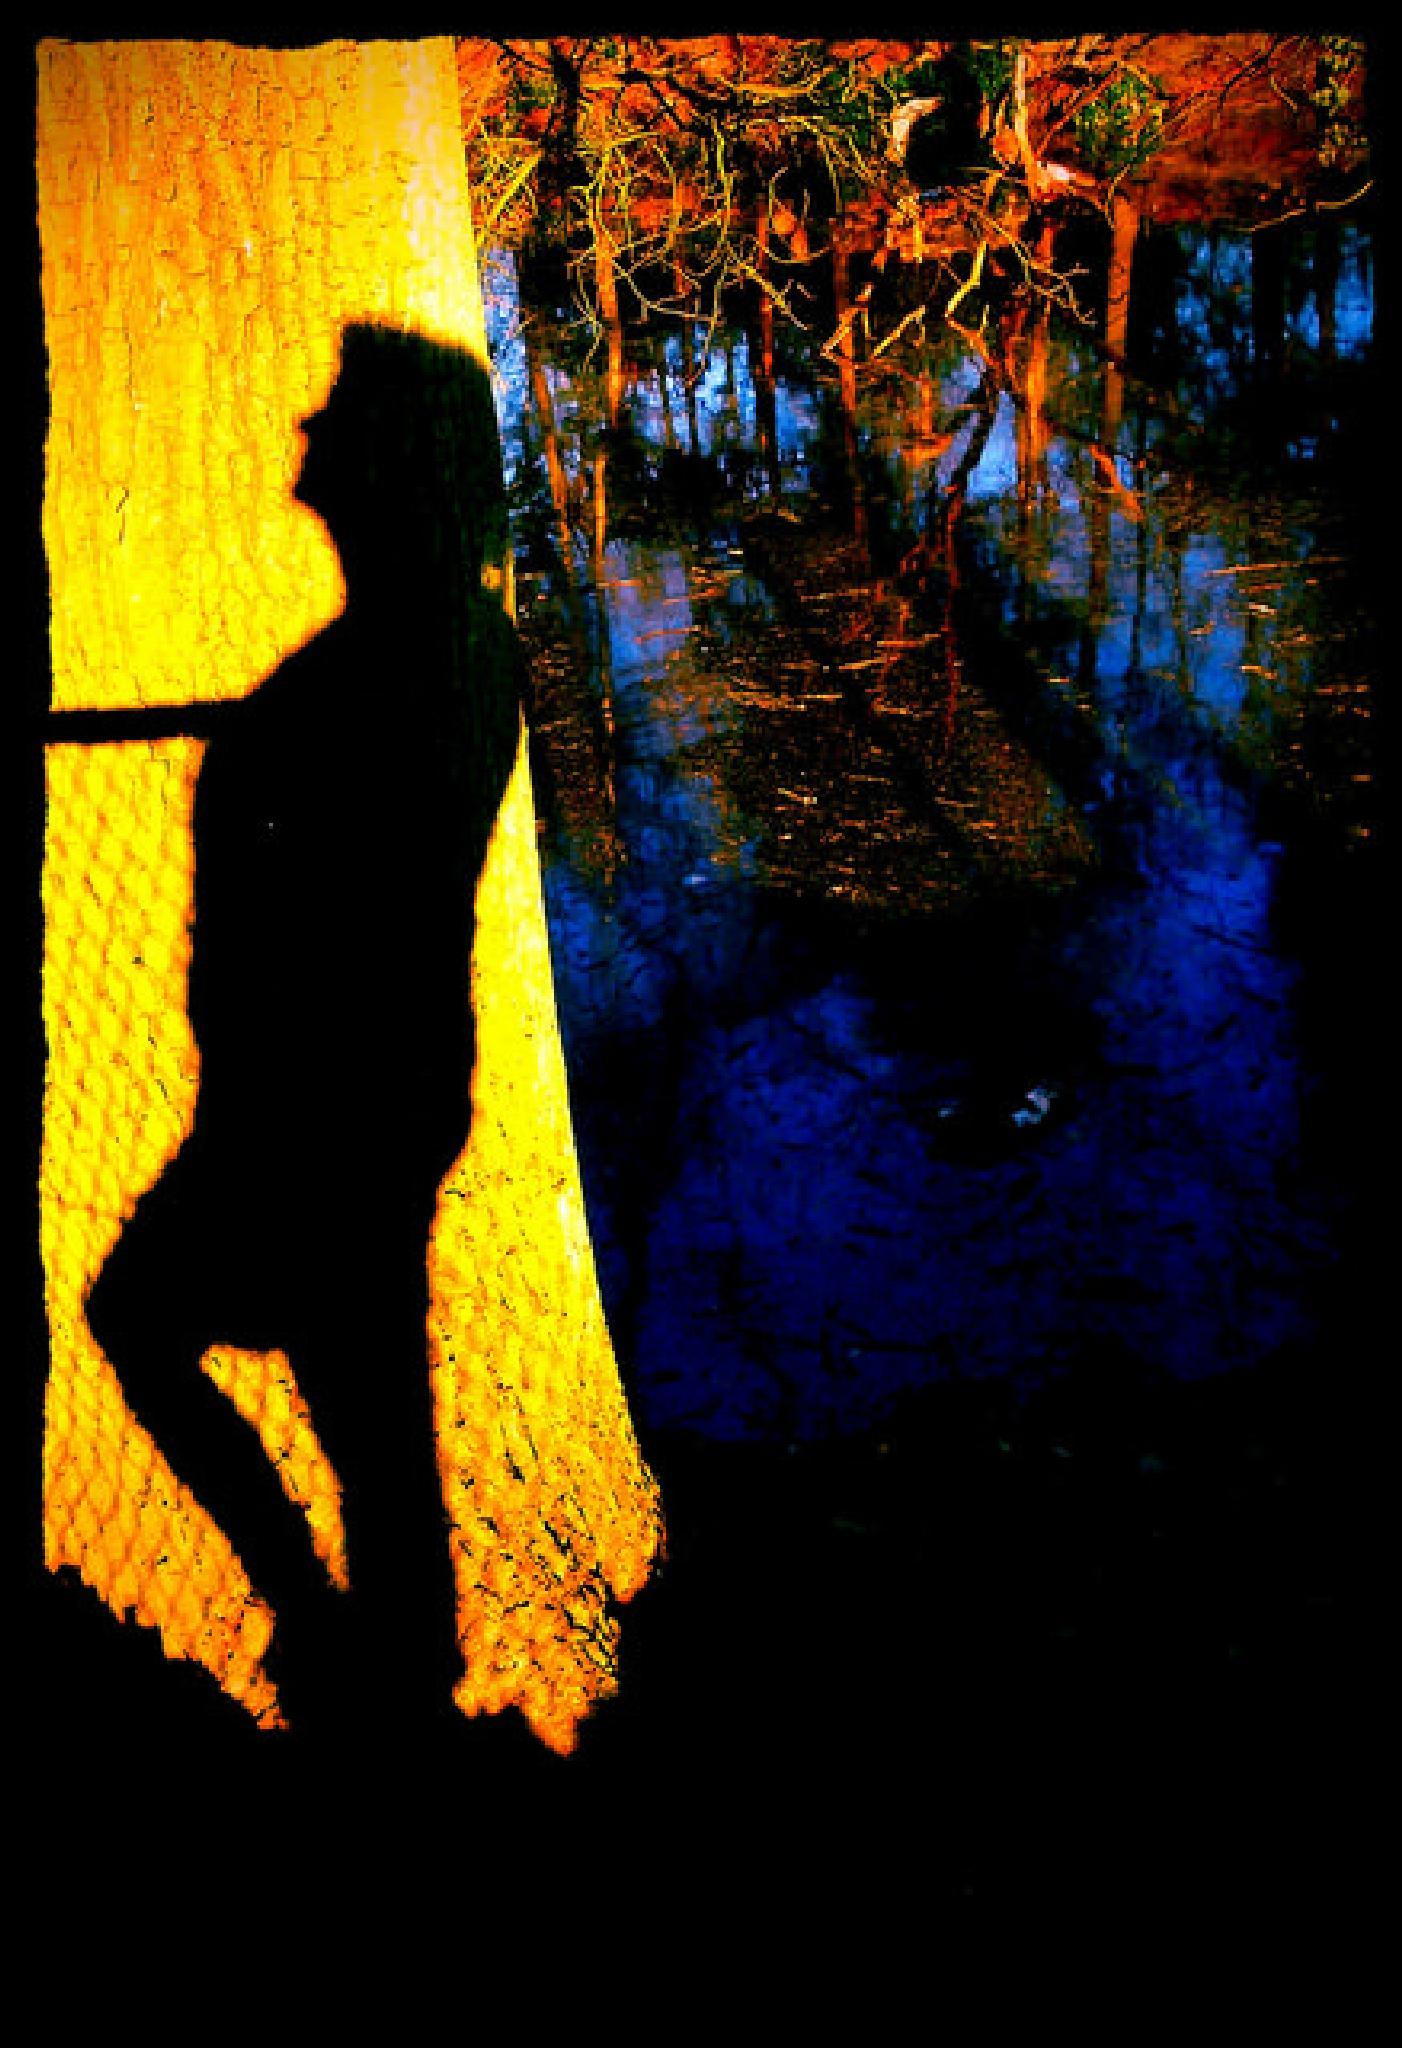 sunny shadow by ann van aken